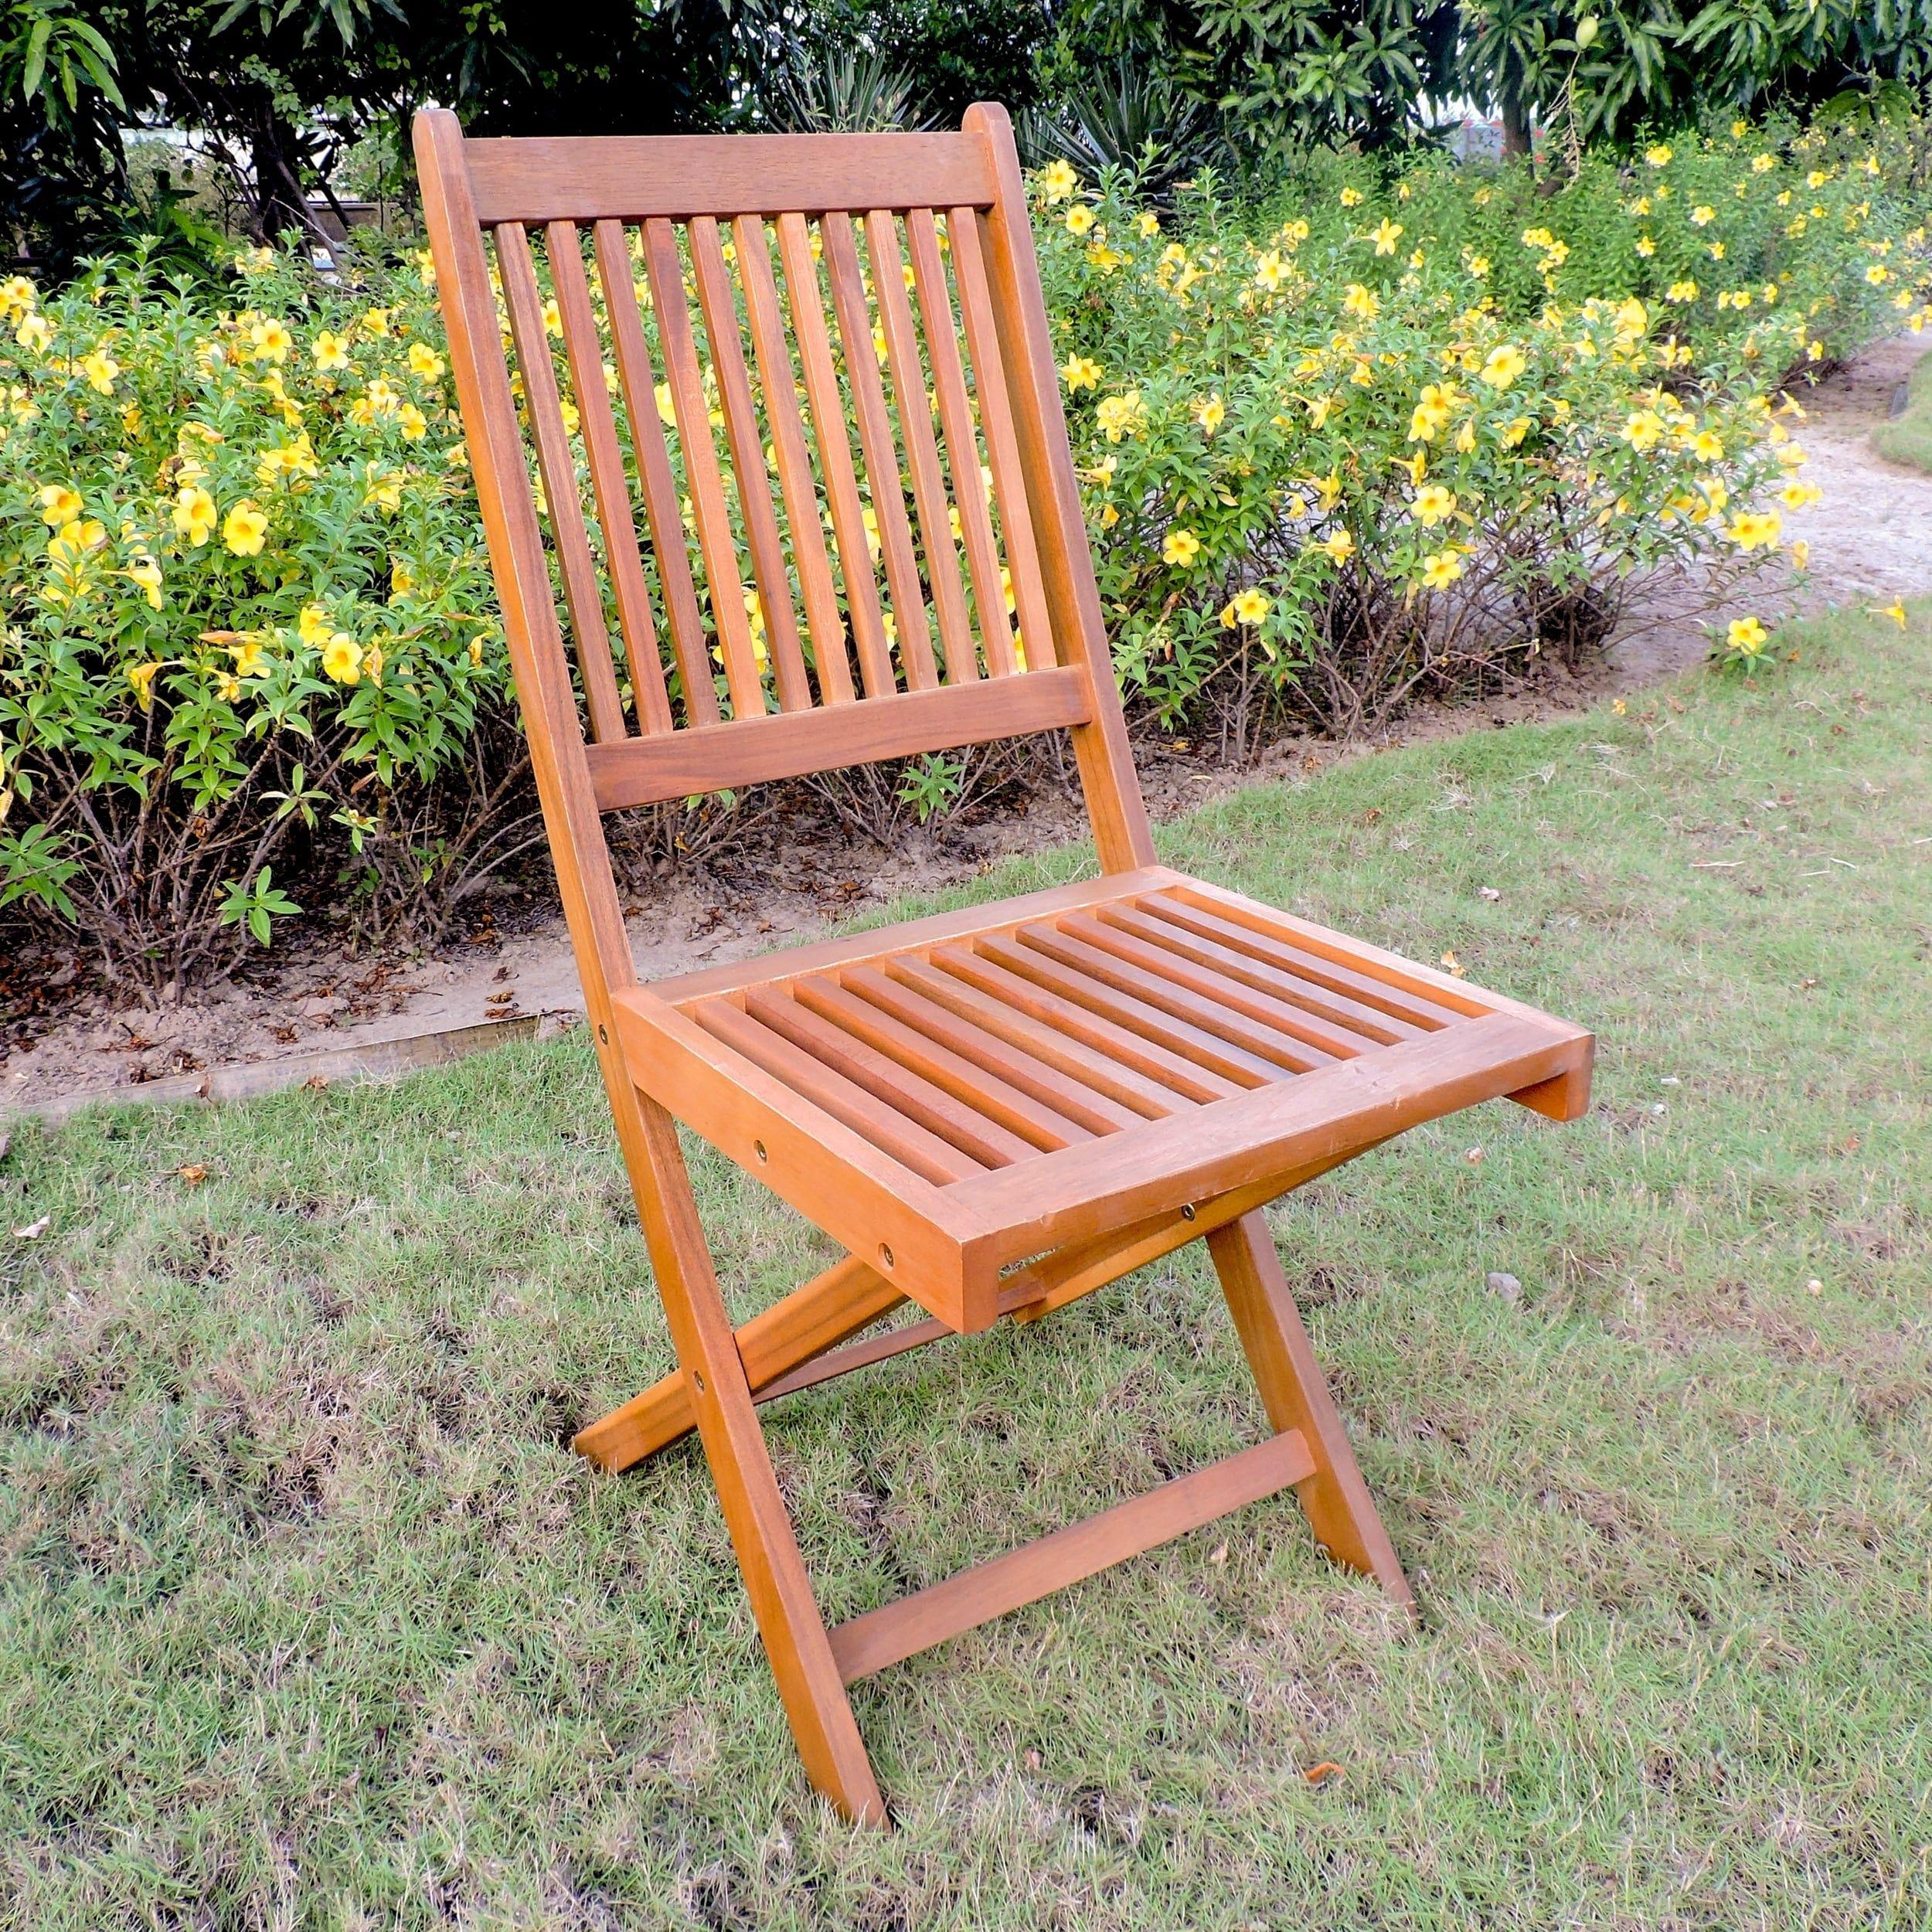 Pleasing International Caravan Royal Fiji Acacia Folding Dining Chair Evergreenethics Interior Chair Design Evergreenethicsorg